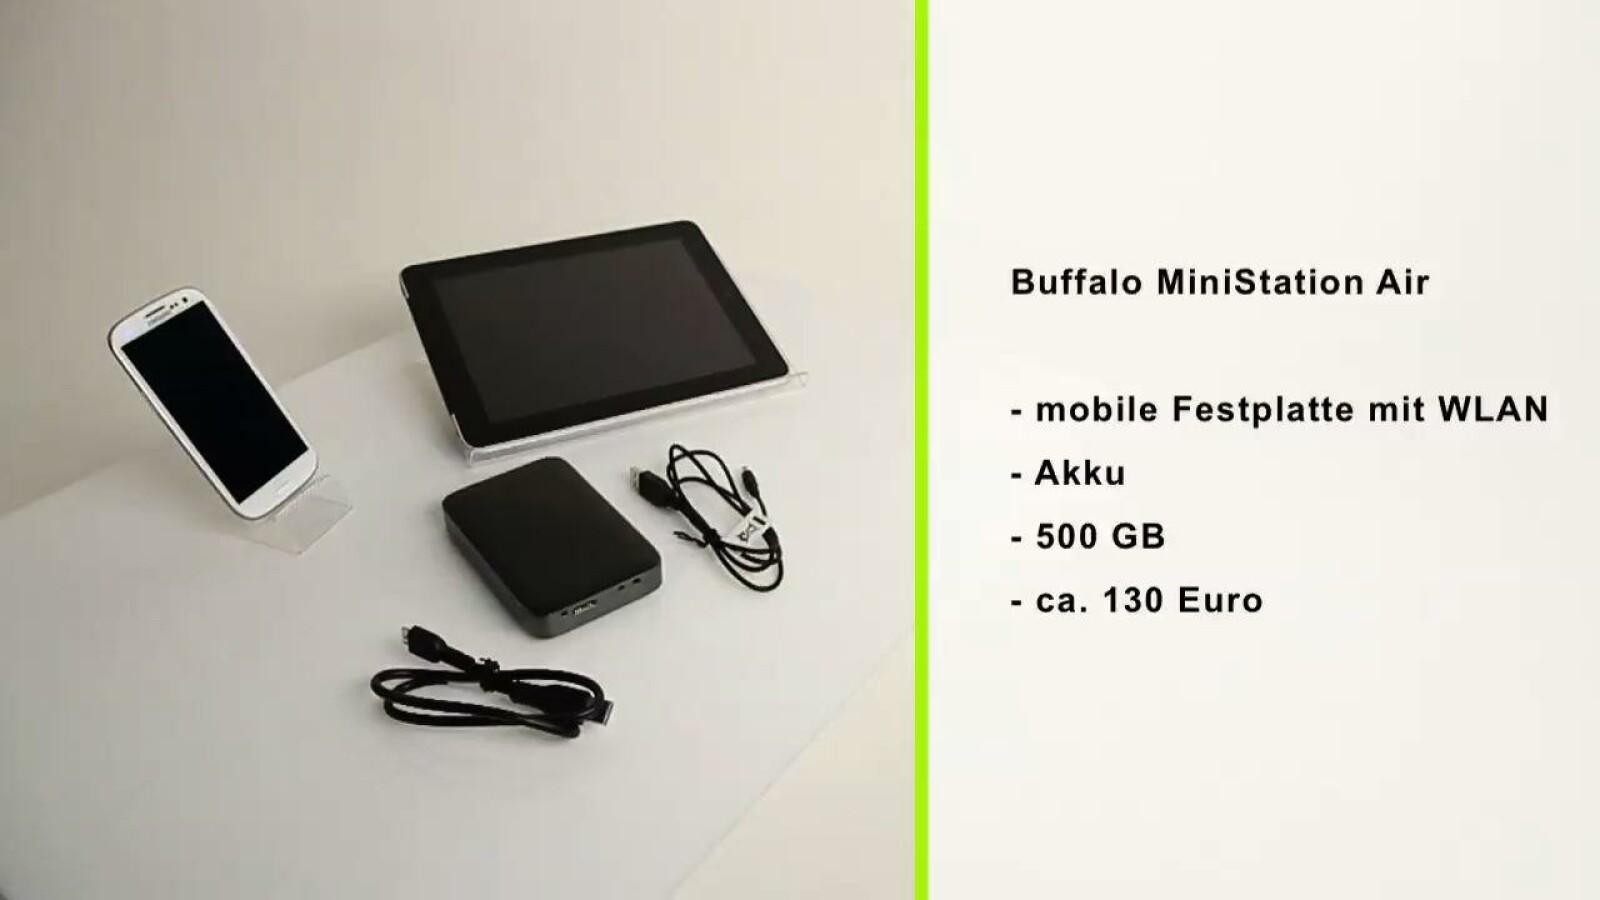 Buffalo Ministation Air Im Test Netzwelt Transcend Storejet 1tb 25amp039 Usb 30 25m3